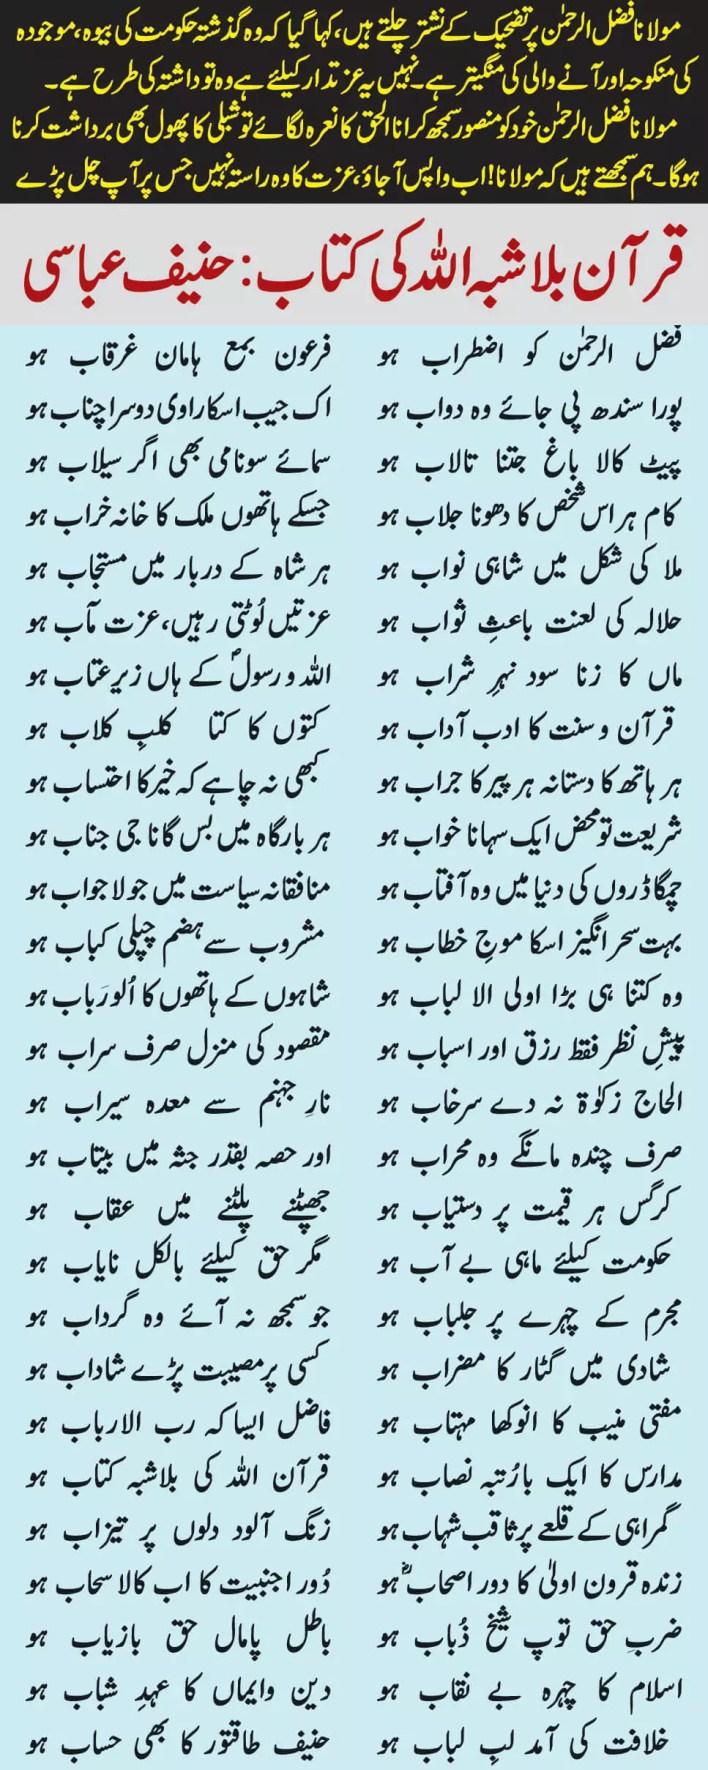 molana-fazal-ur-rehman-chapli-kabab-kalabagh-dam-mufti-muneeb-halala-teen-talaq-syed-atiq-ur-rehman-gailan(2)i